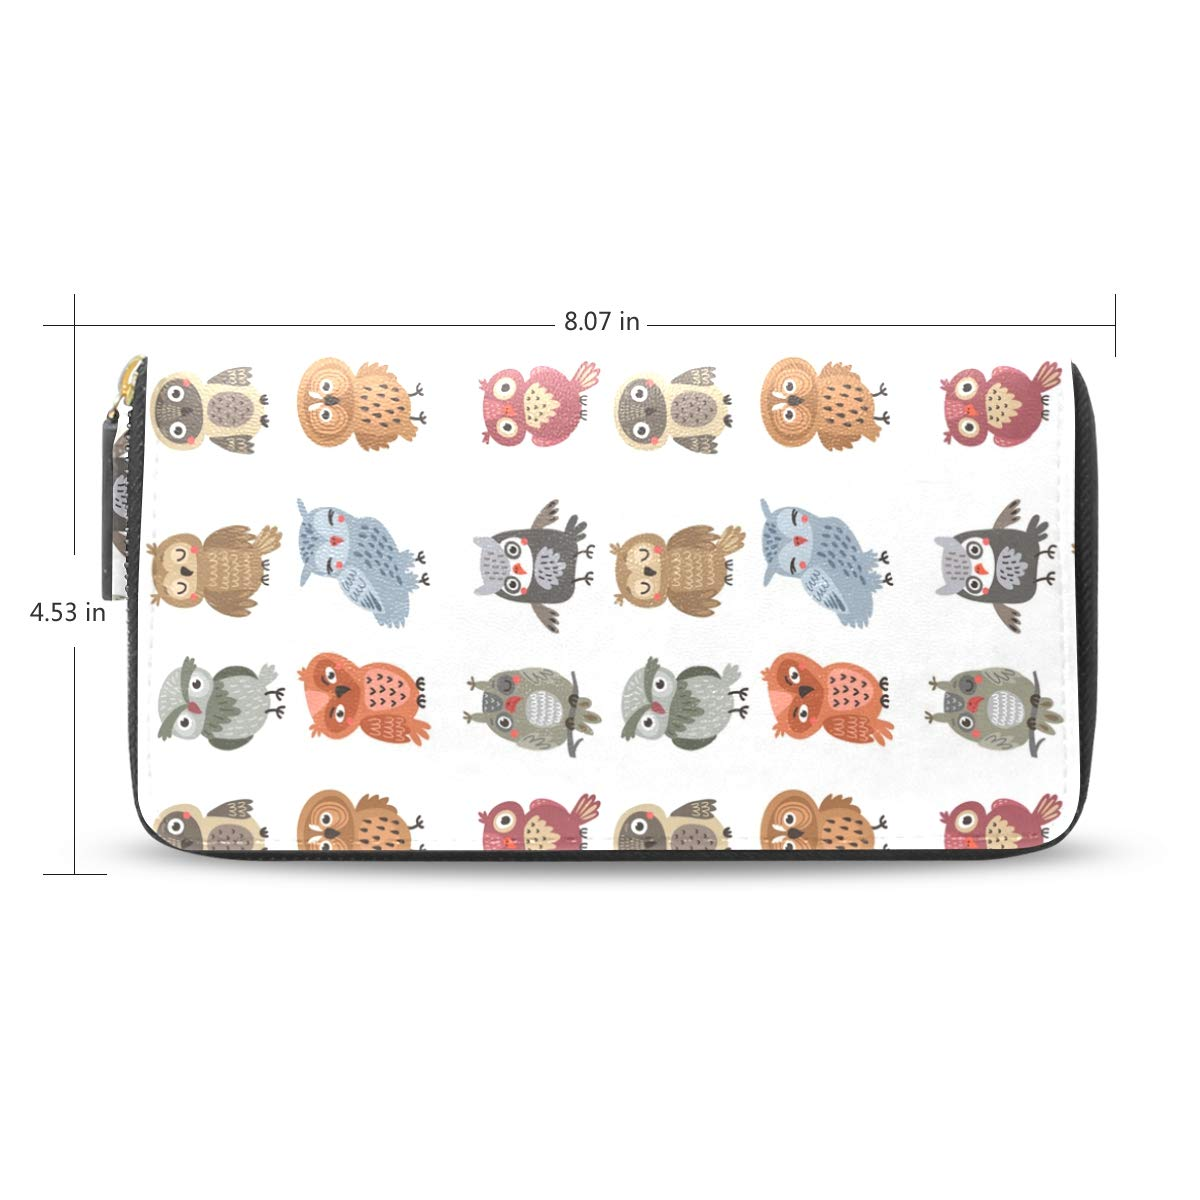 Women LeatherOwls Pattern Wallet Large Capacity Zipper Travel Wristlet Bags Clutch Cellphone Bag